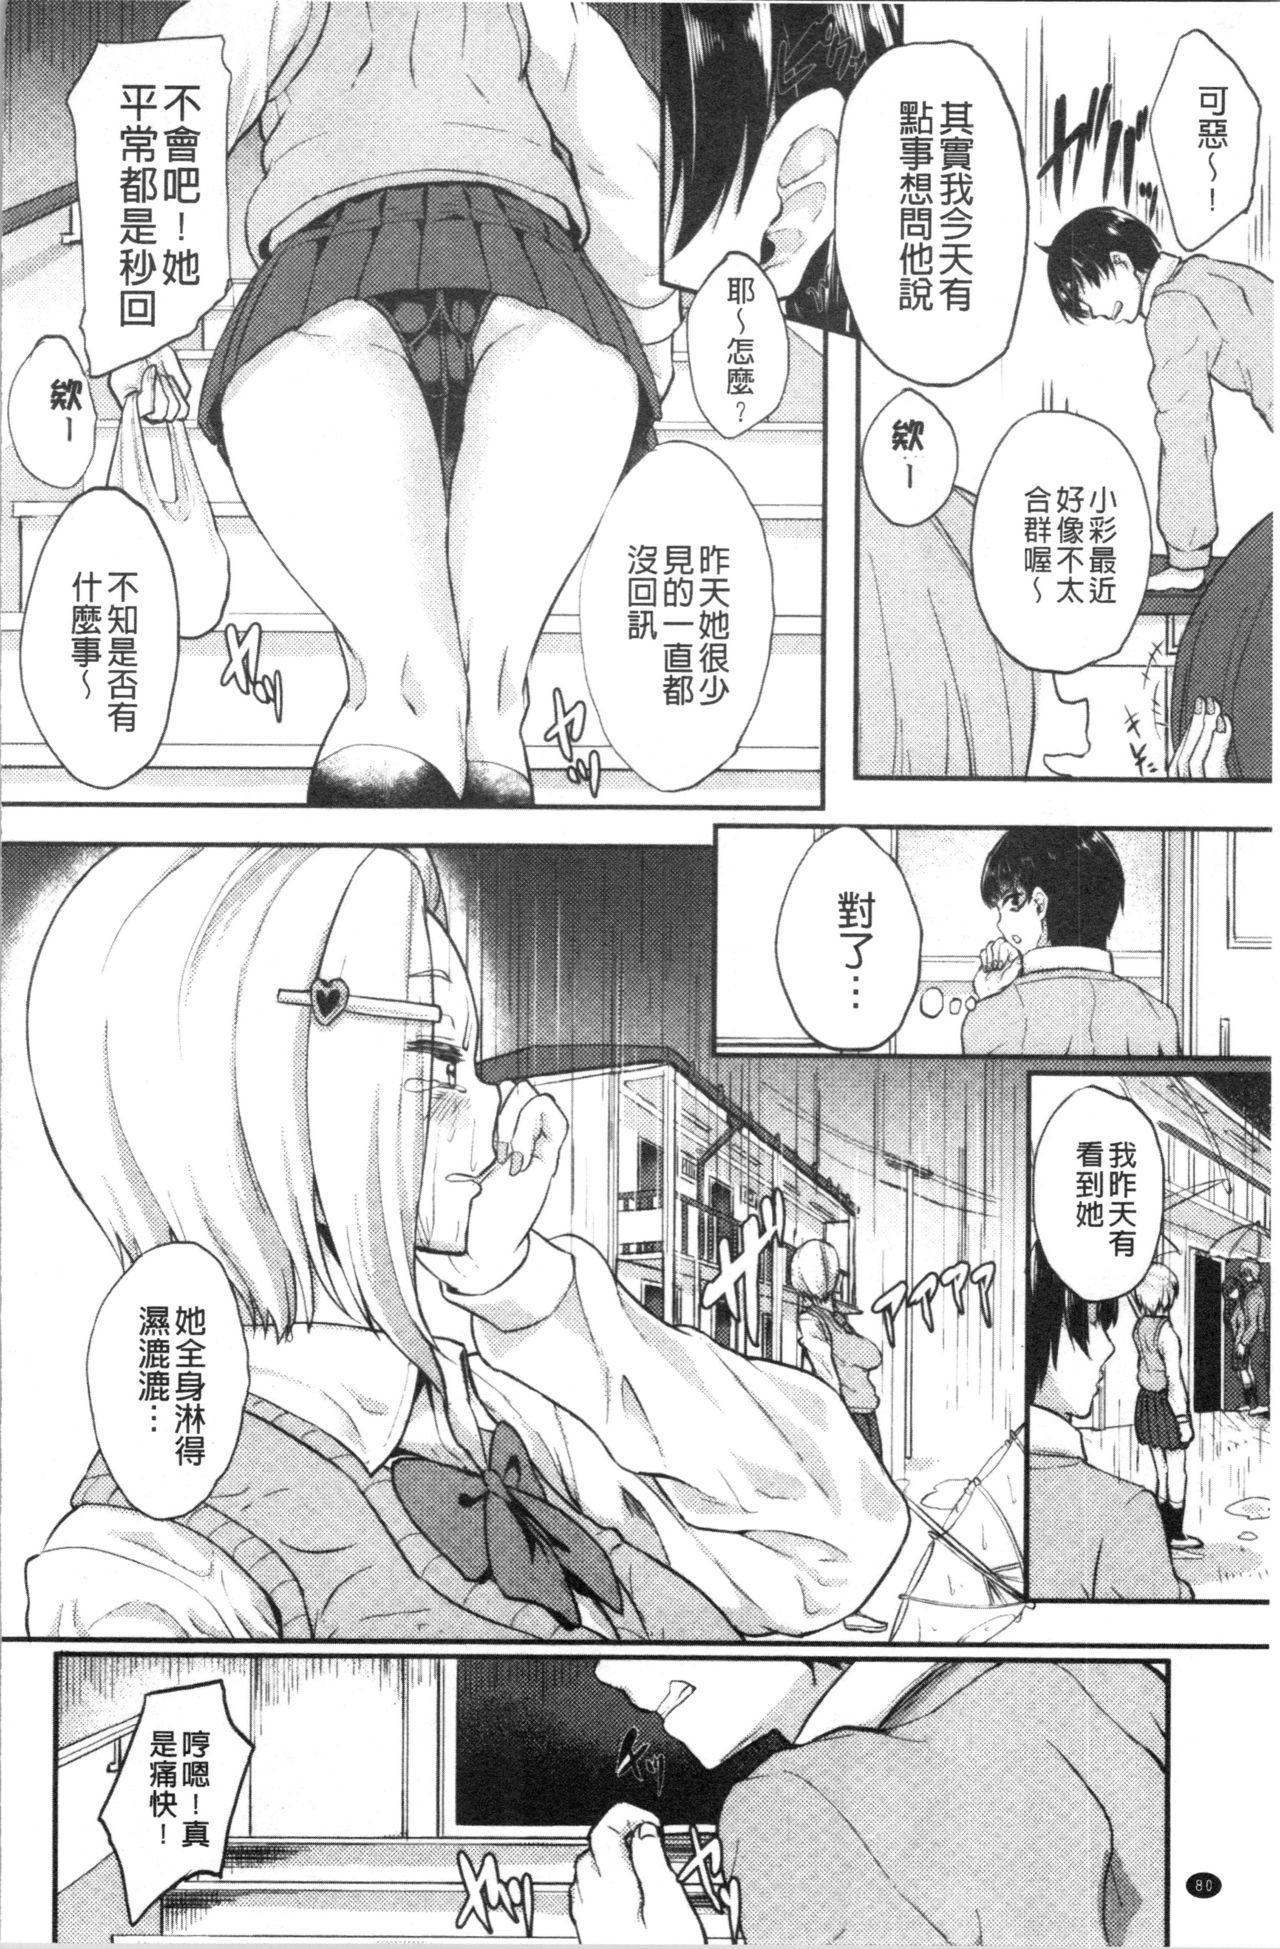 Kanojo ga SEX ni nare teru wake | 女友對激情性愛變很習慣的理由 82